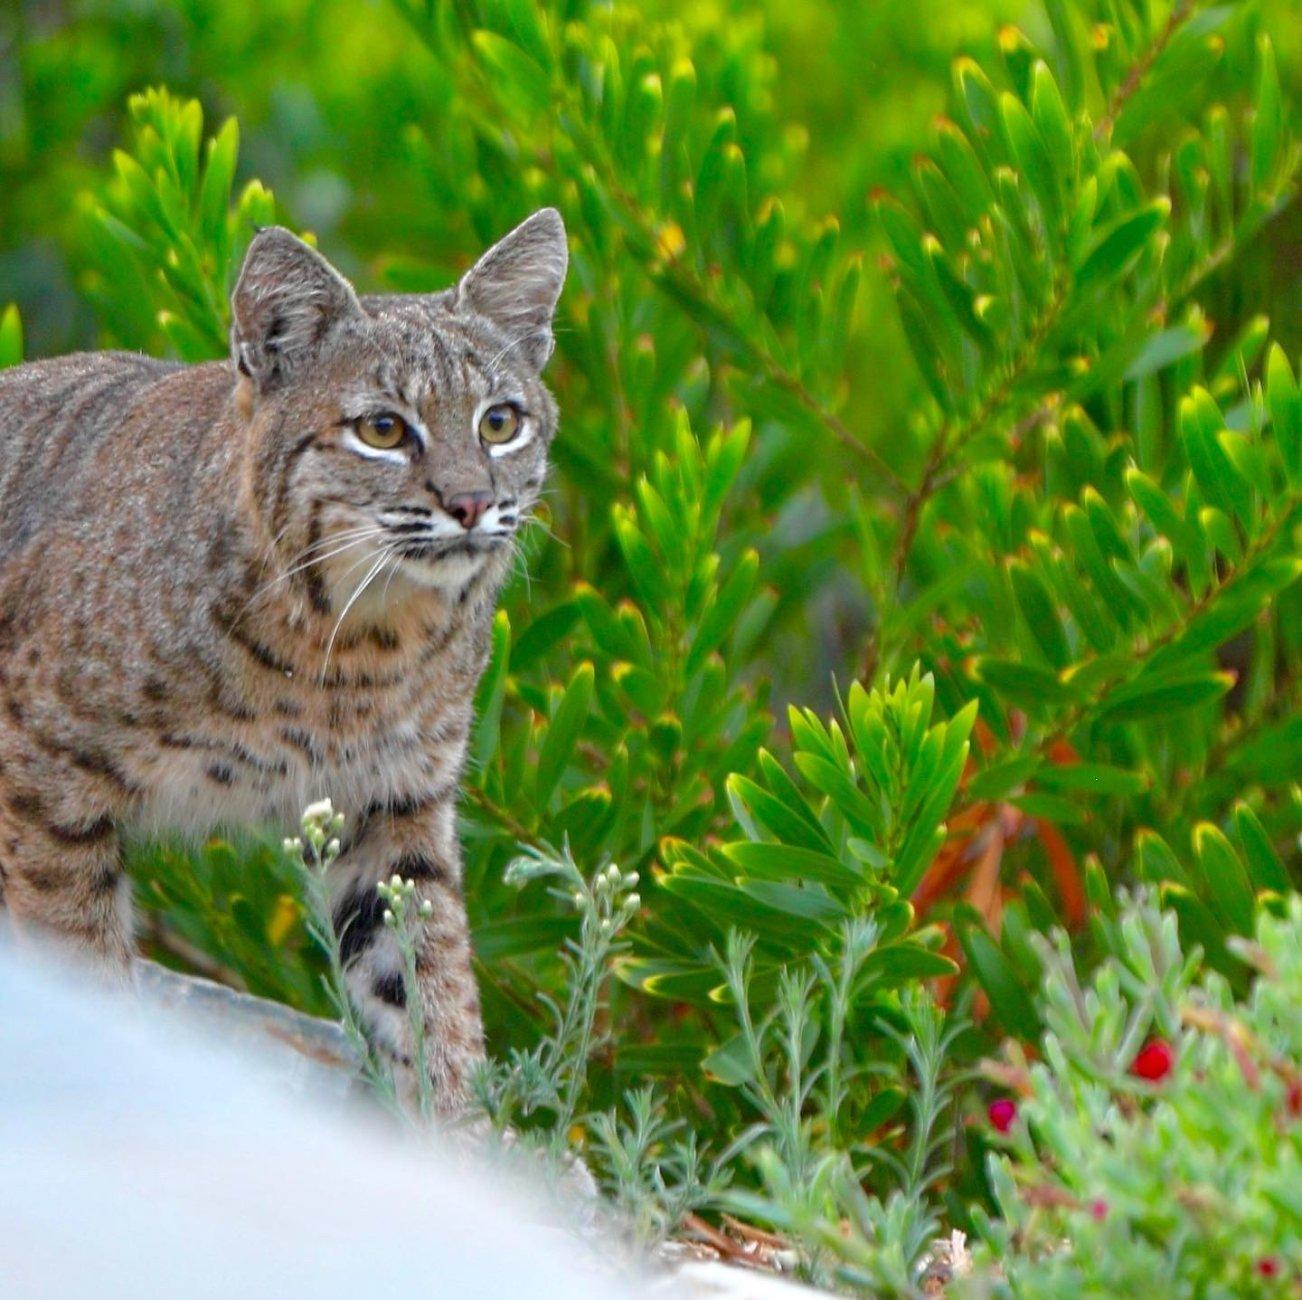 Bobcat in the garden